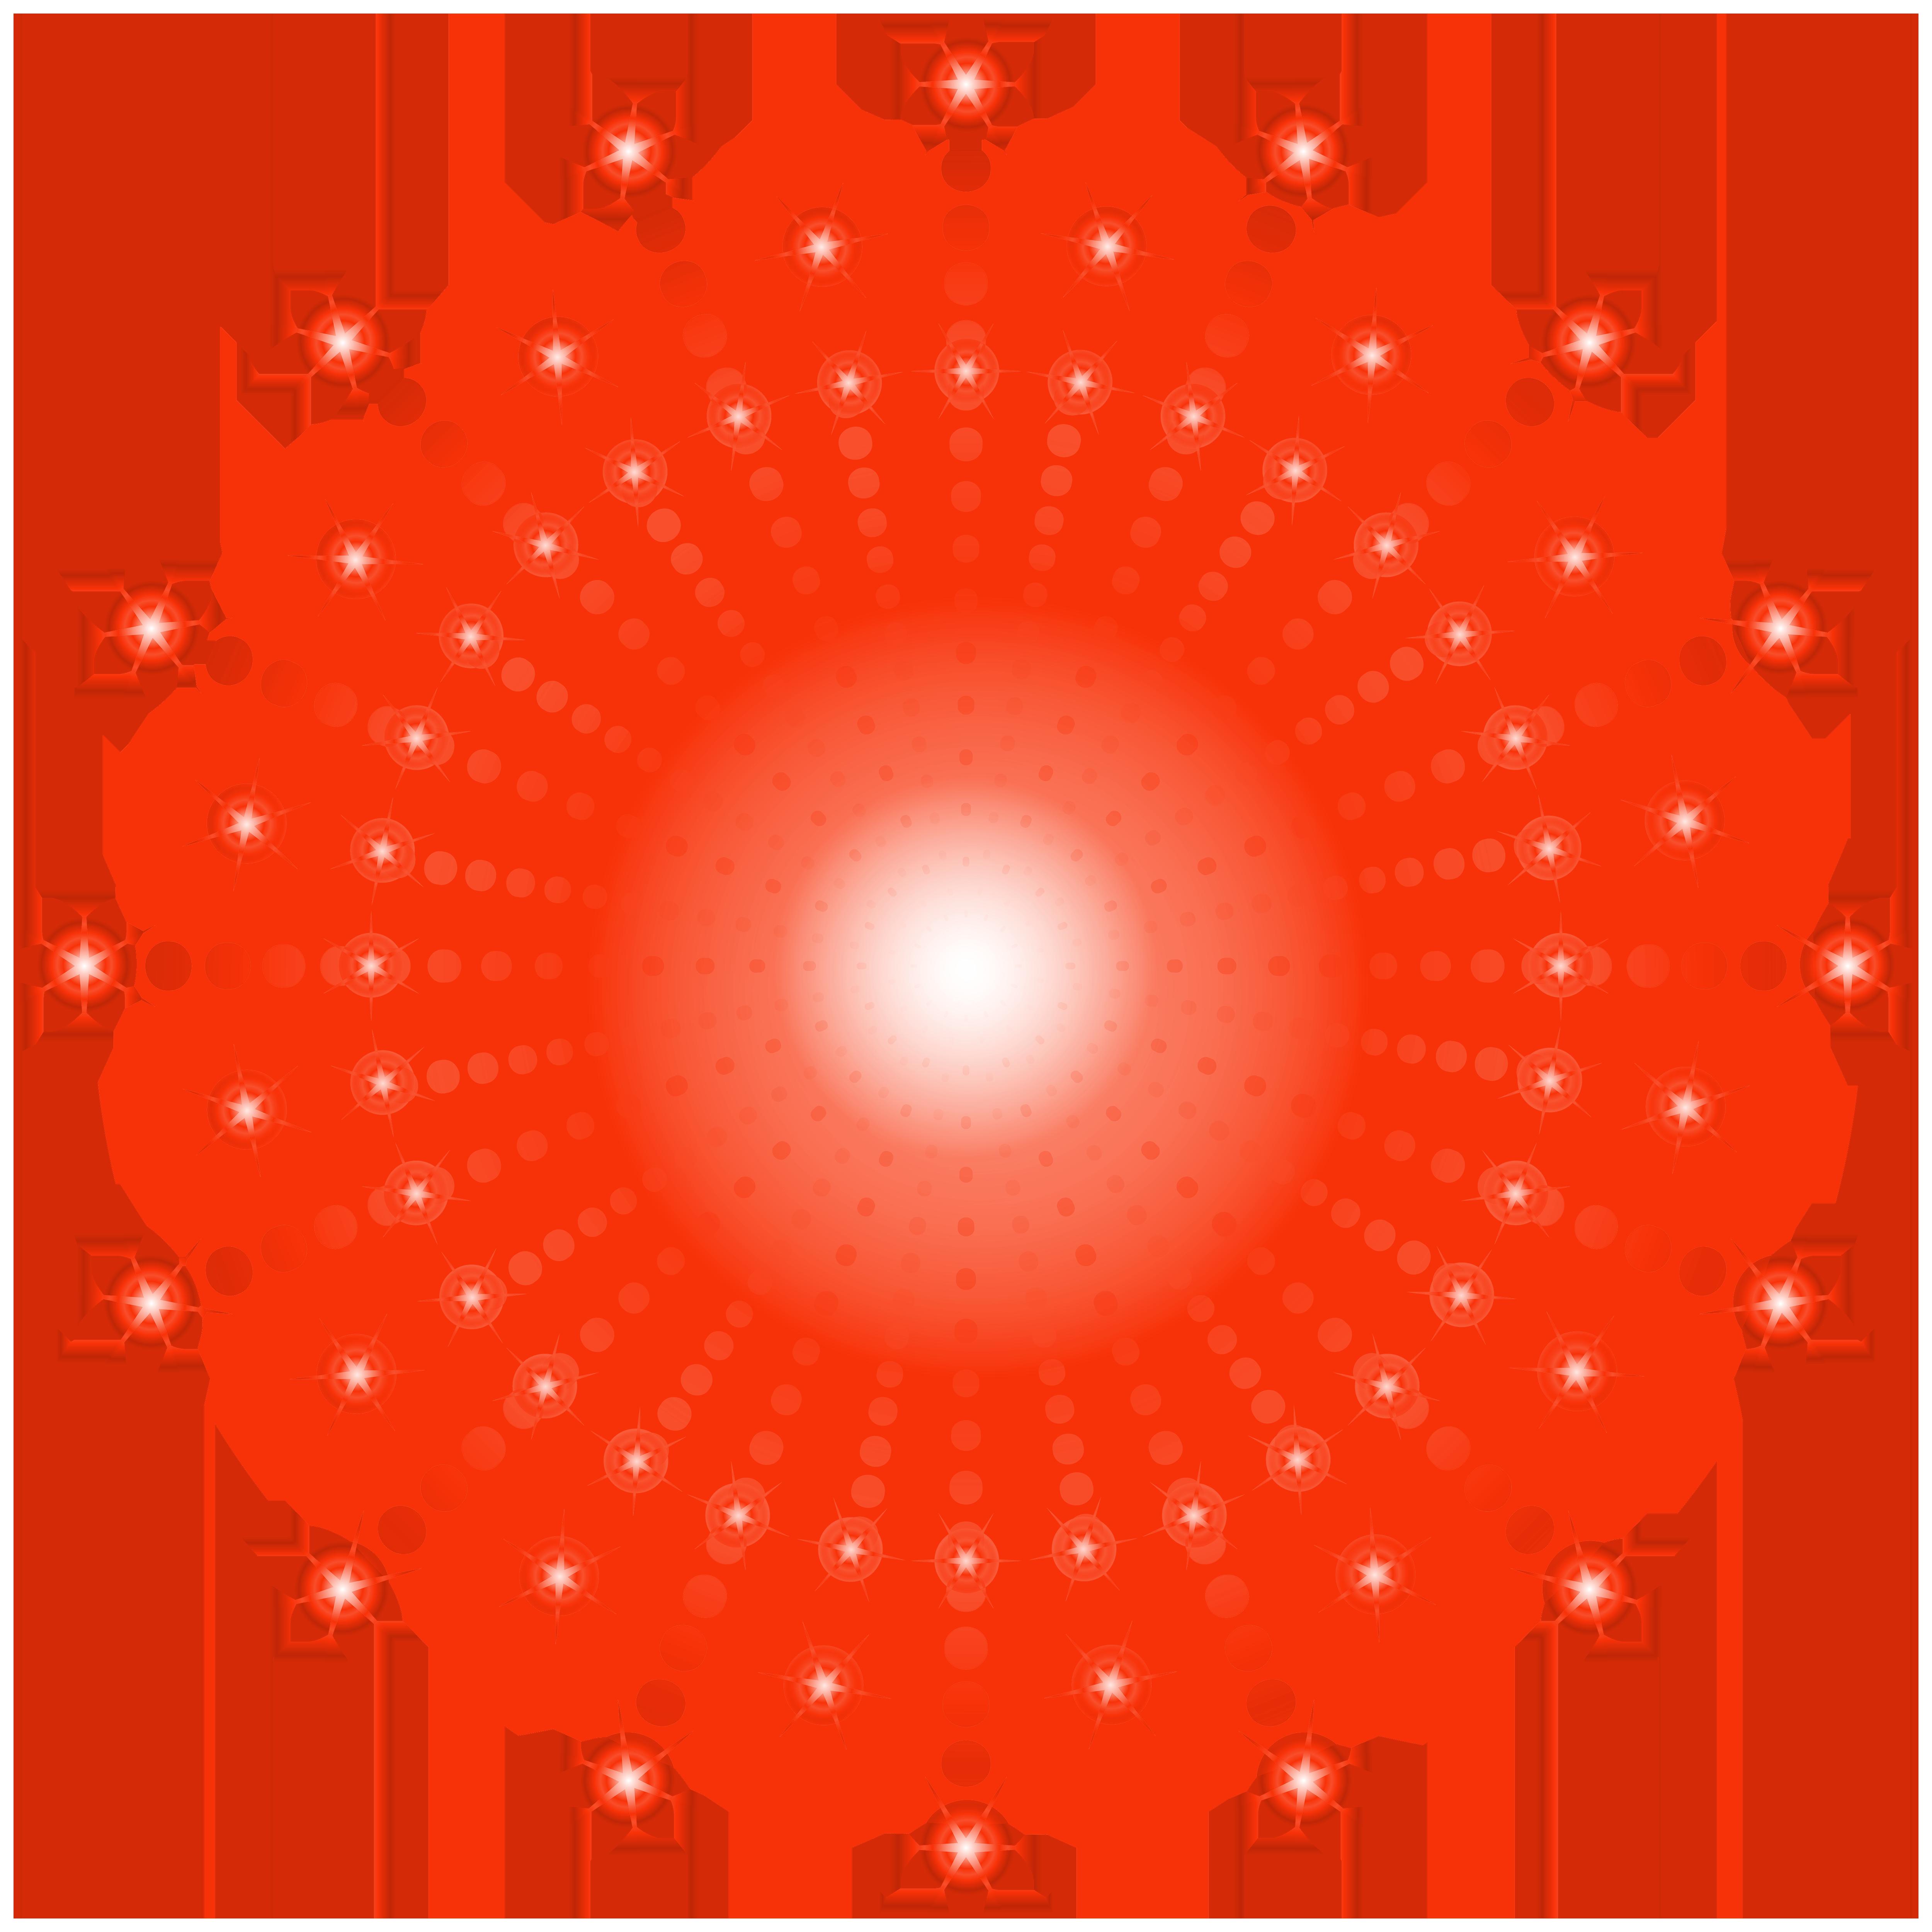 Firework clipart orange. Red png clip art